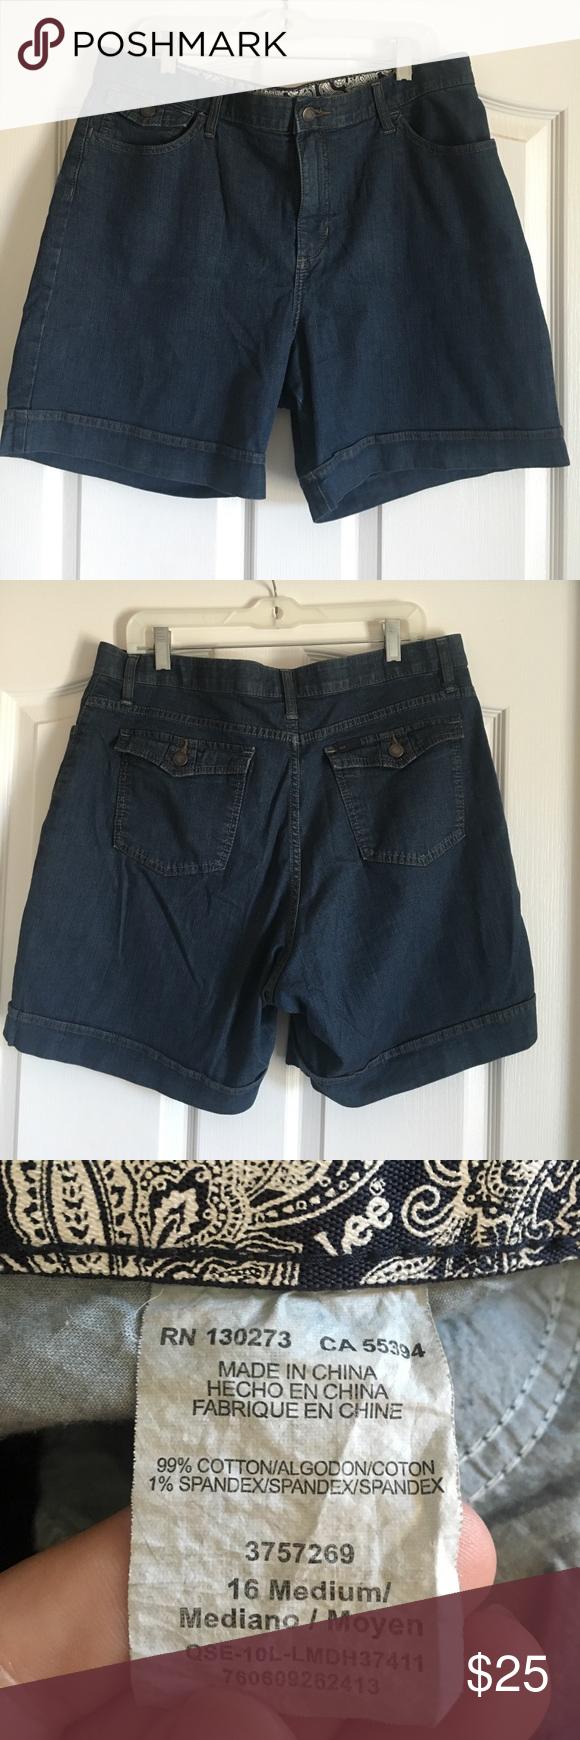 Lee dark-wash womens shorts, size 16, EUC Lee dark wash shorts ...